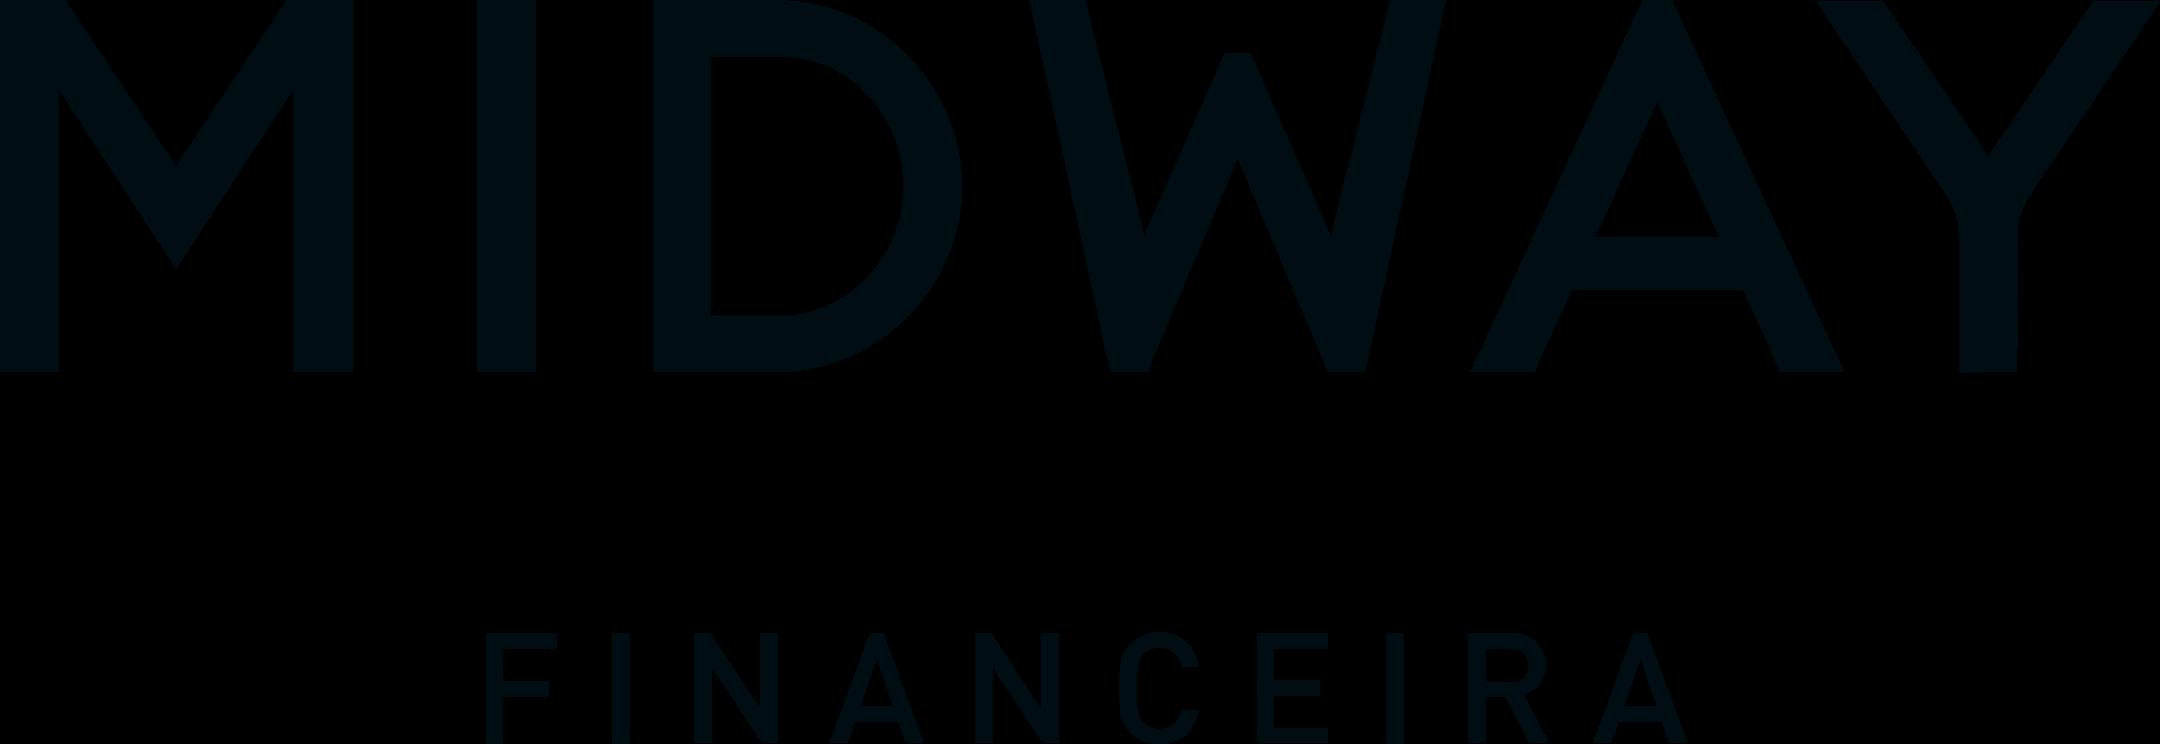 midway financeira logo 1 - Midway Financeira Logo